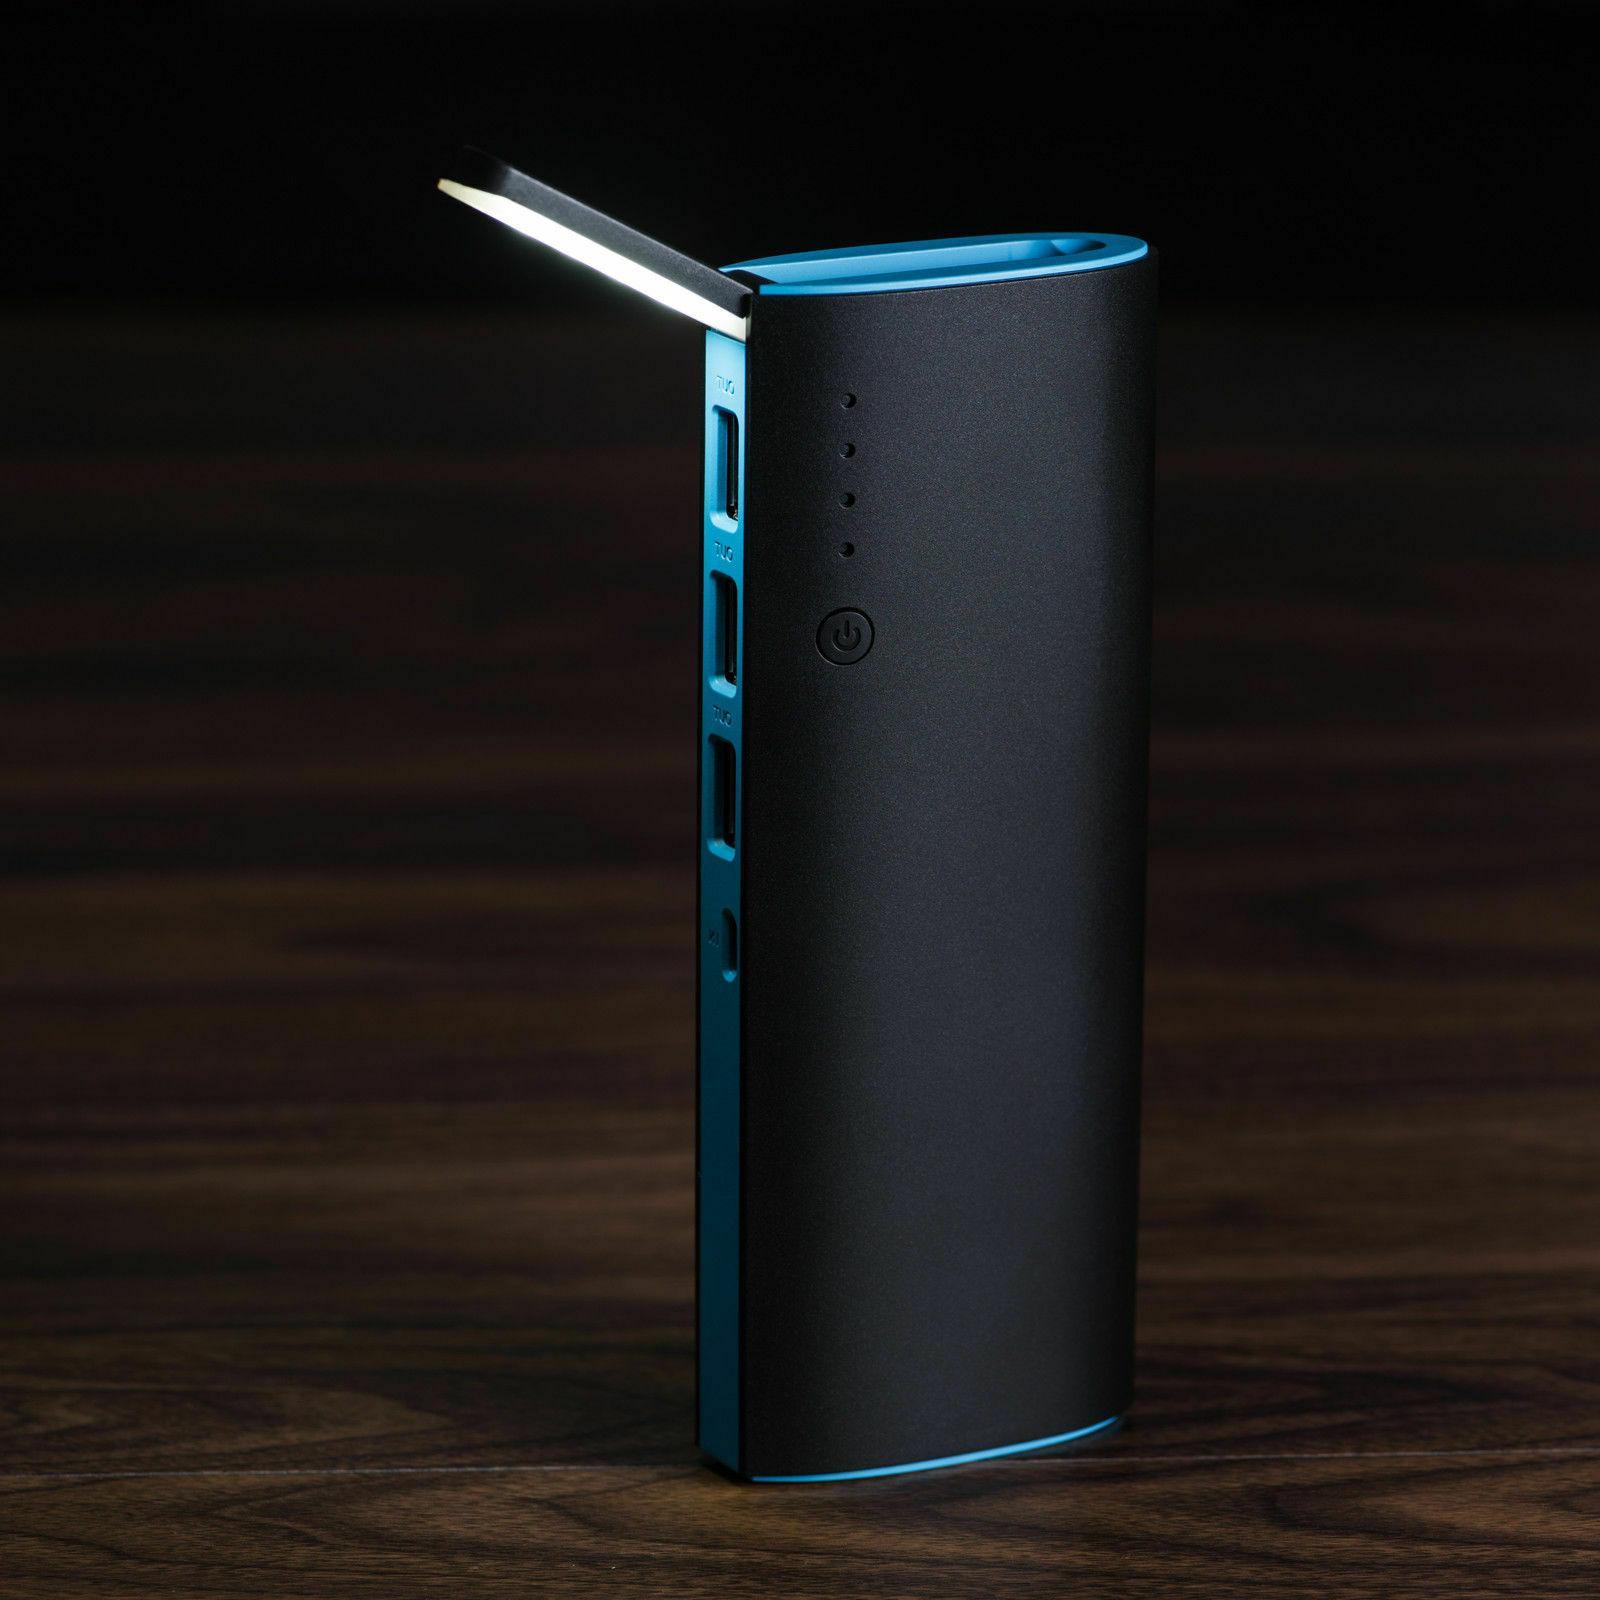 900000mAh Power LED Charger Phone US